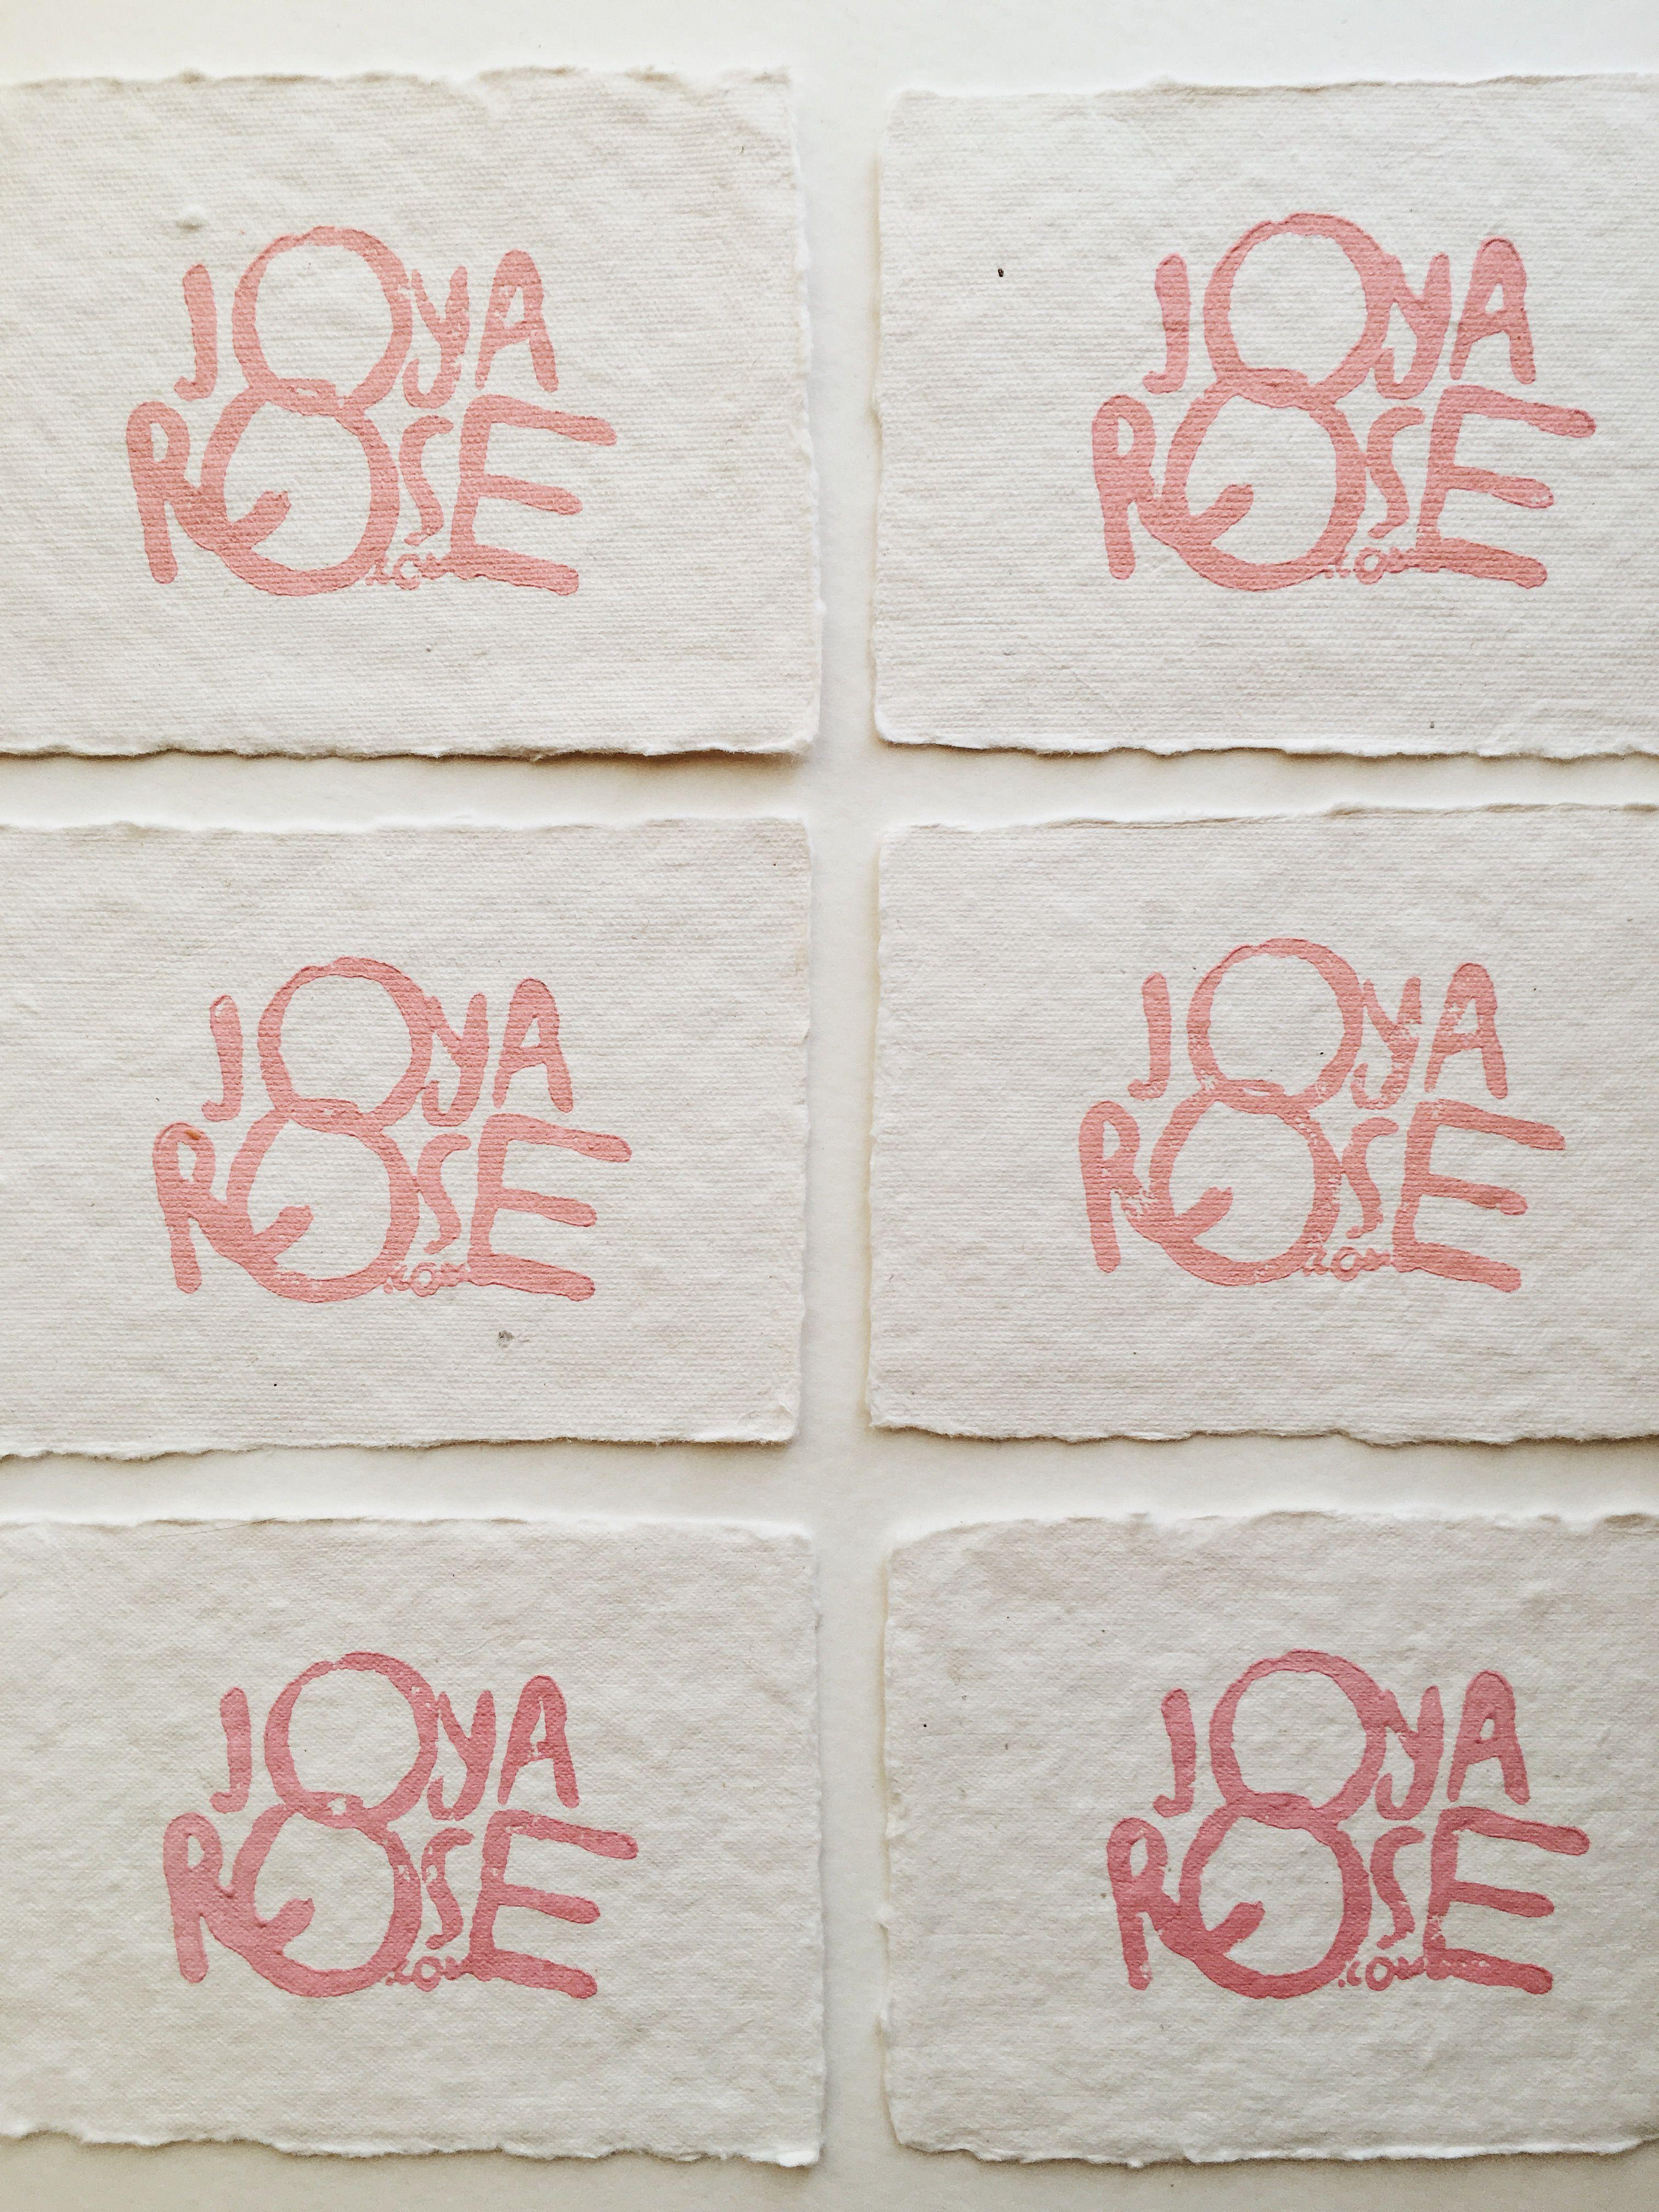 Block printed blush business cards on handmade paper by Joya Rose ...